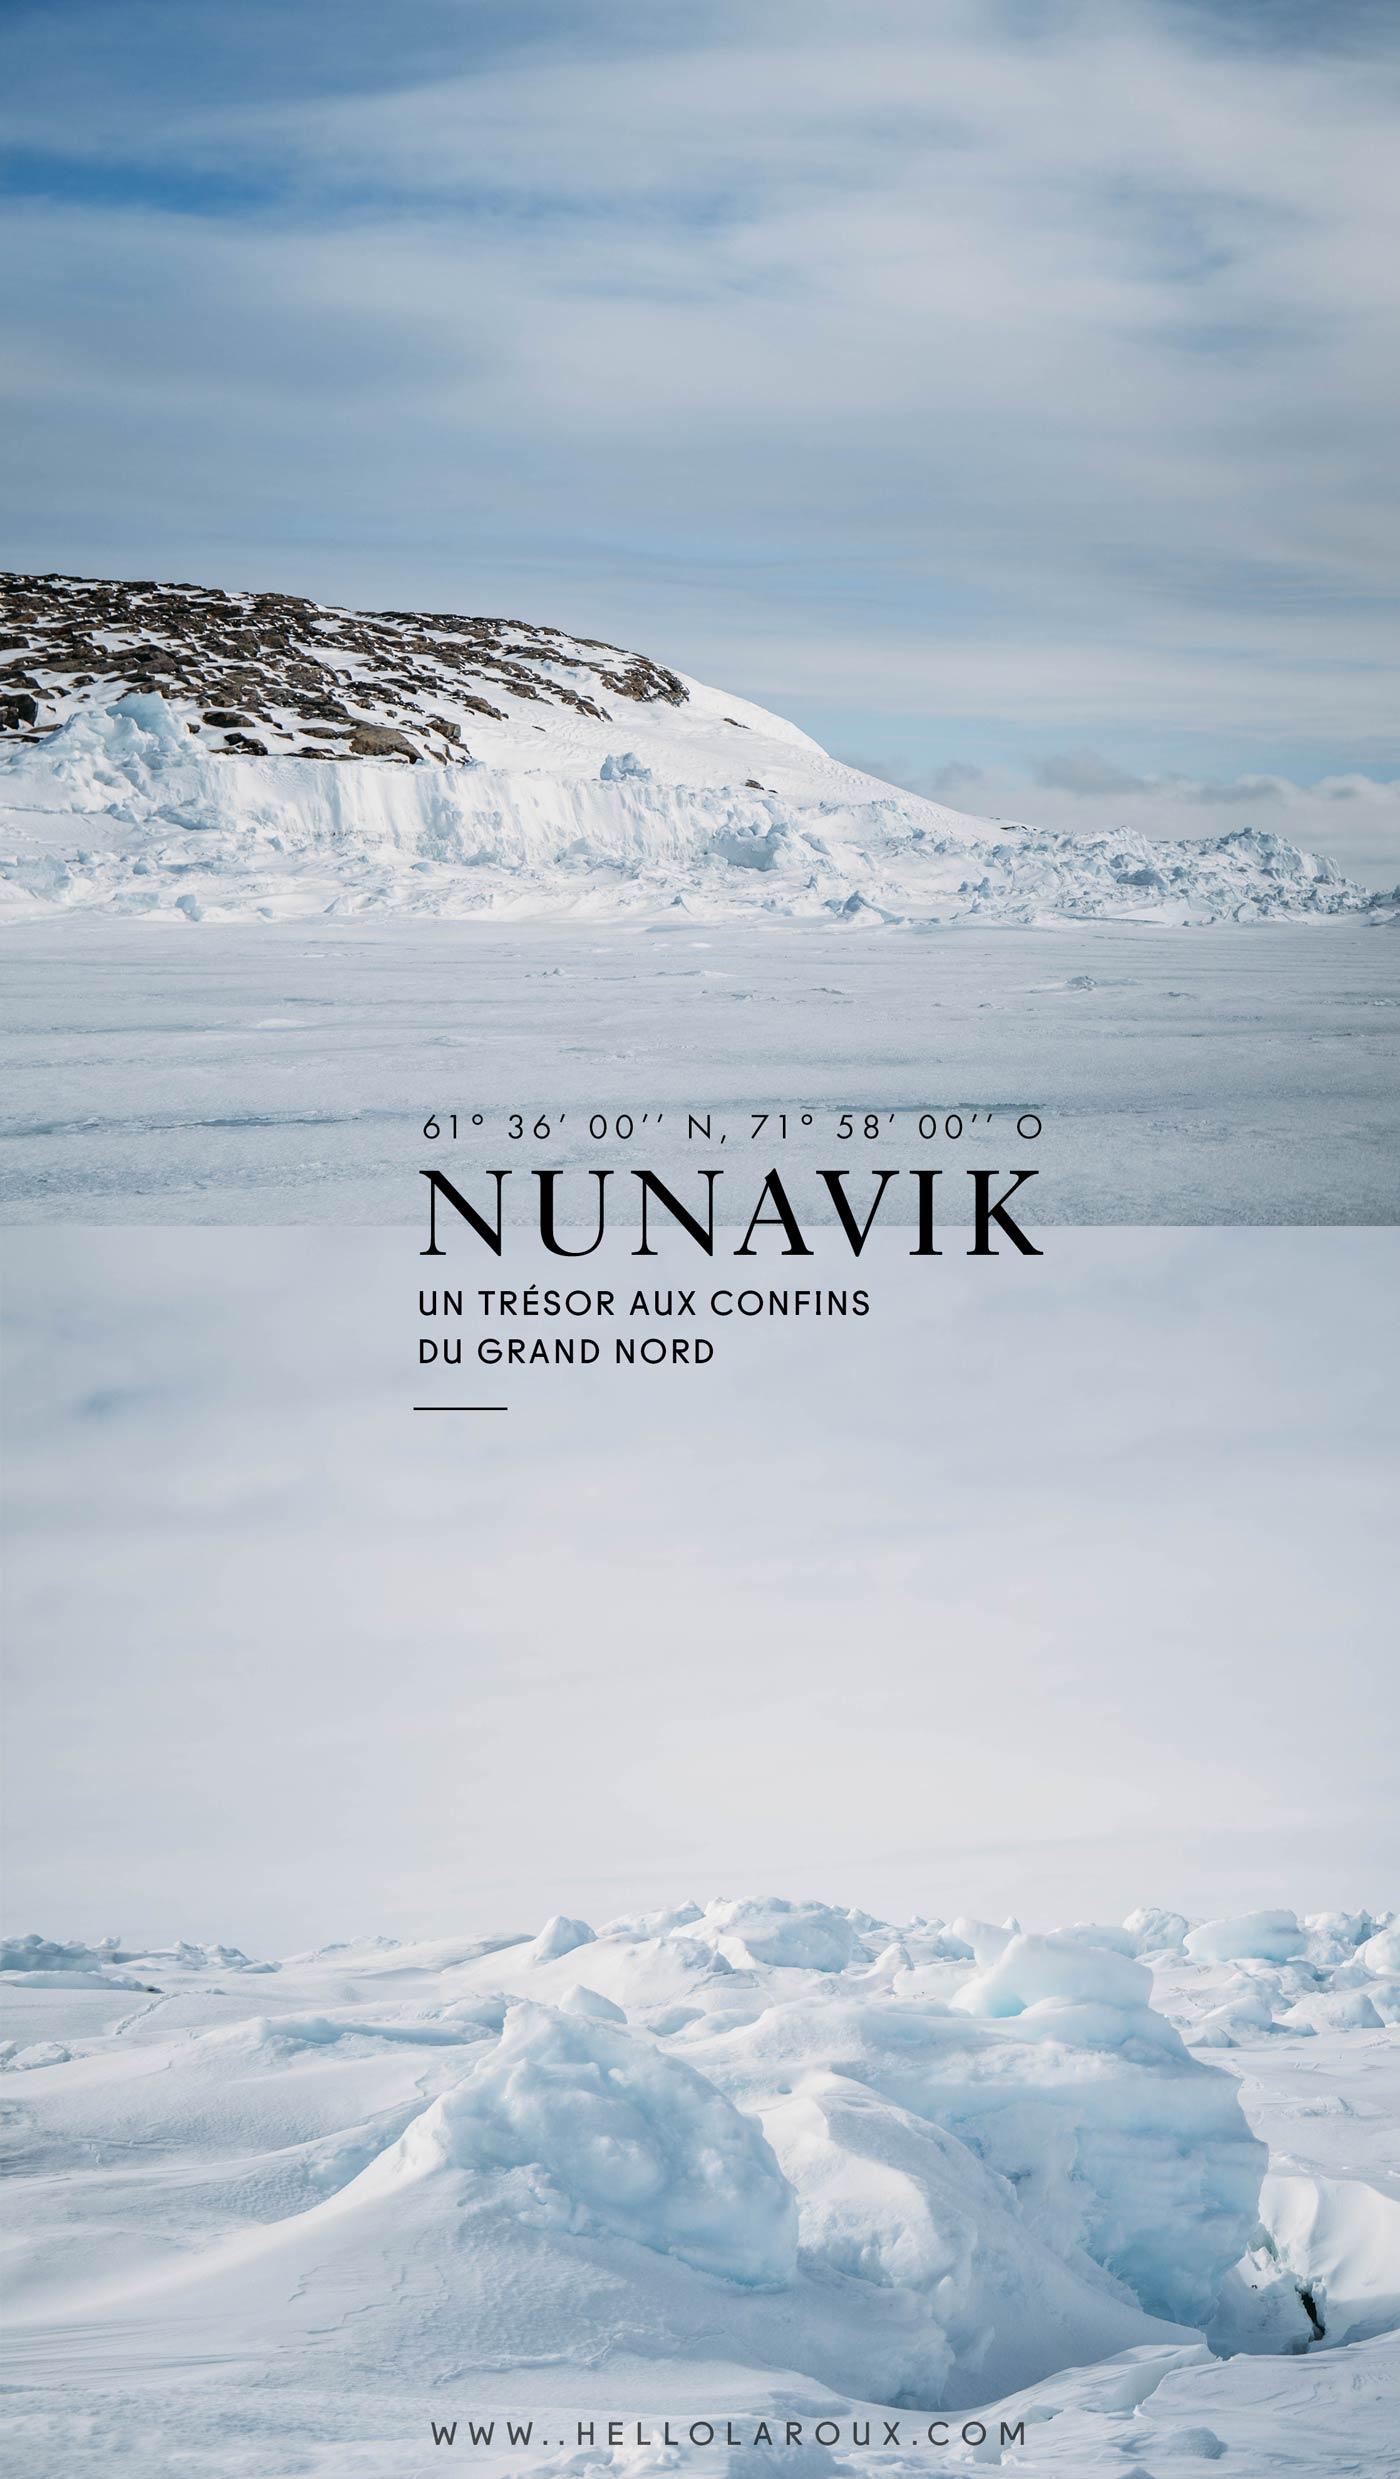 expédition Nunavik Grand nord Canada